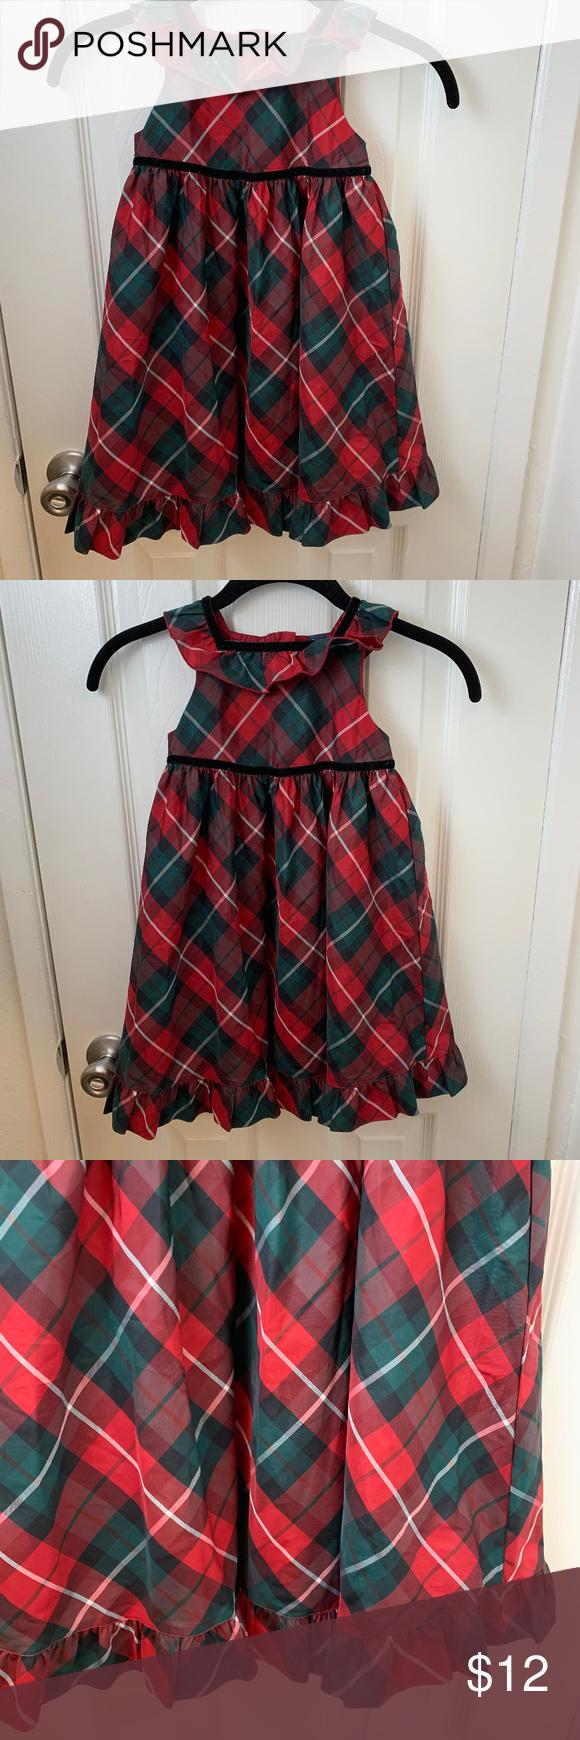 Gap Toddler Red Green Plaid Dress 4t Green Plaid Dress Plaid Dress Gap Dress [ 1740 x 580 Pixel ]